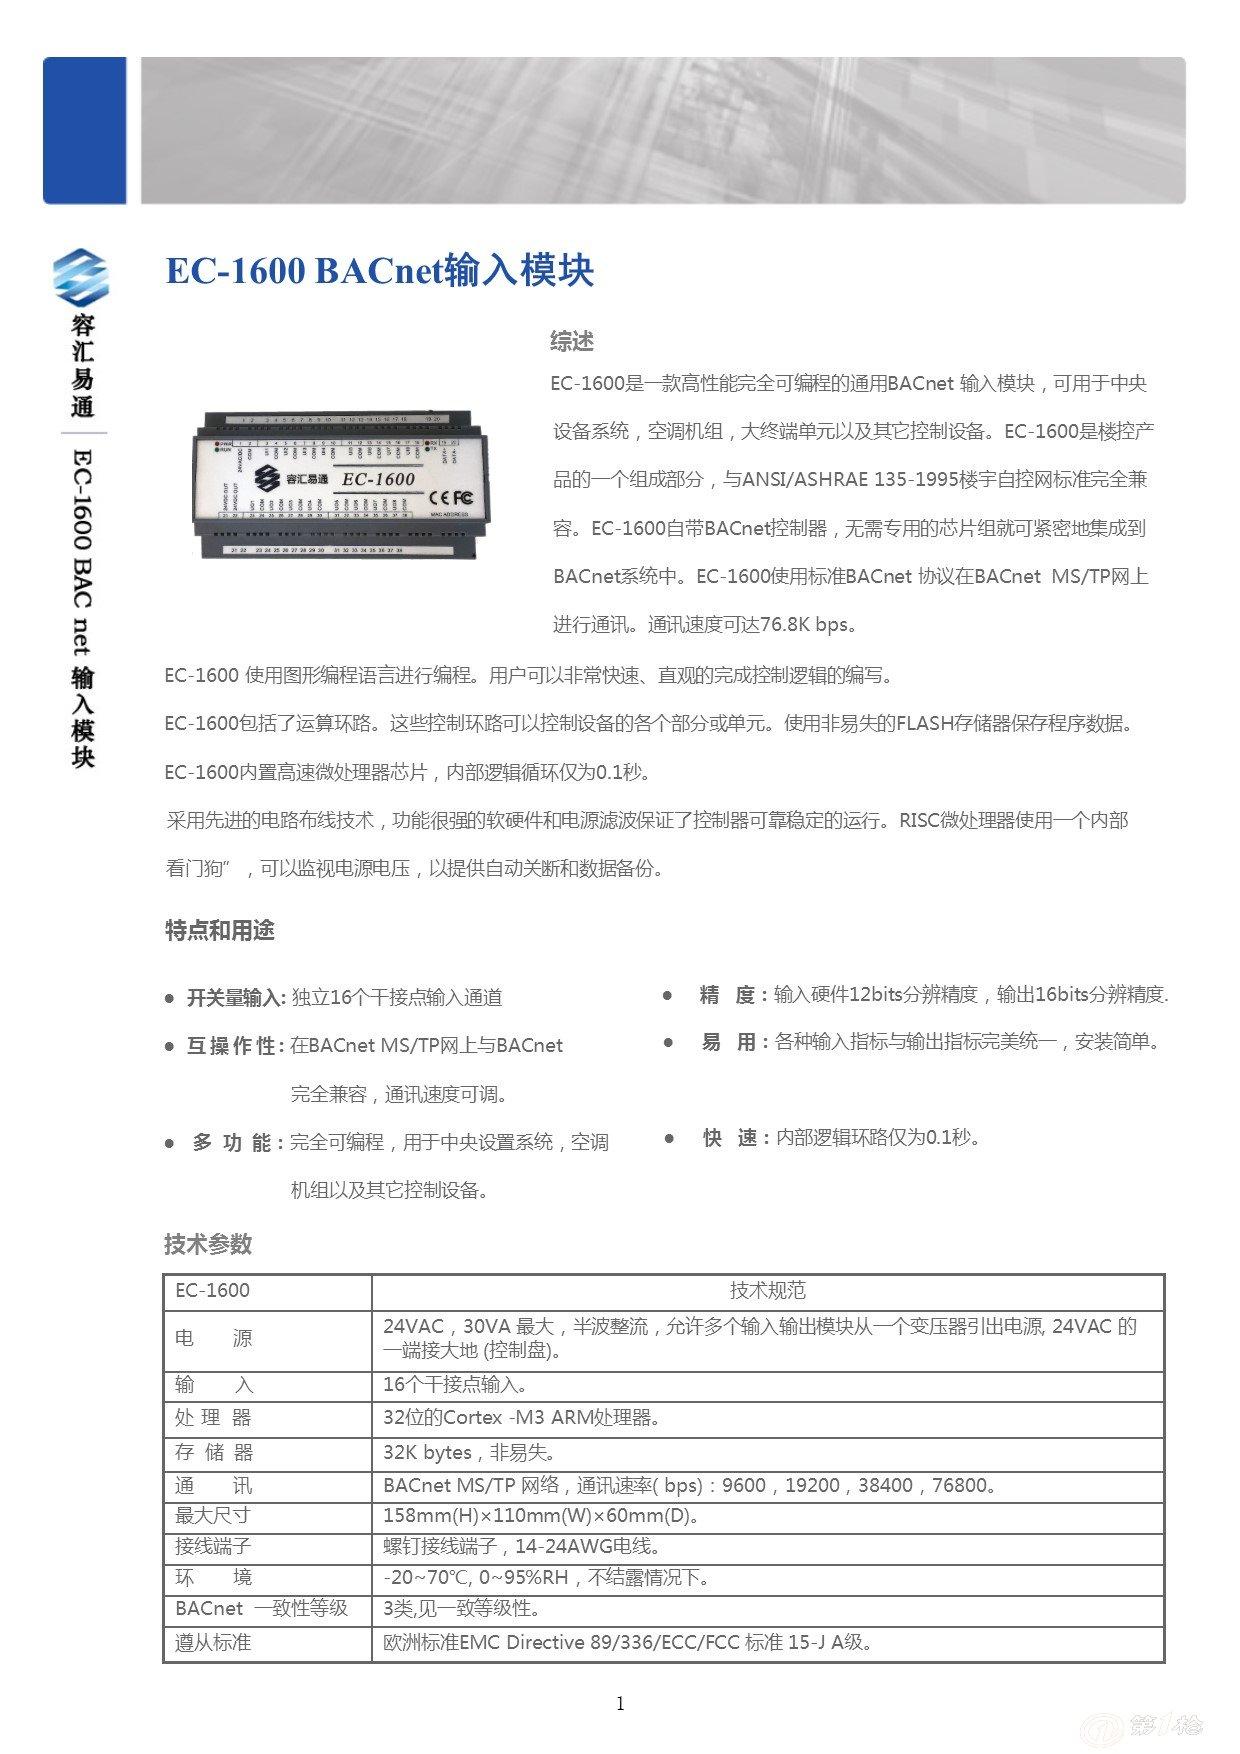 EC-1600是一款高性能完全可编程的通用BACnet 输入模块,可用于中央设备系统,空调机组,大终端单元以及其它控制设备。EC-1600是楼控产品的一个组成部分,与ANSI/ASHRAE 135-1995楼宇自控网标准完全兼容。DEV-1600自带BACnet控制器,无需专用的芯片组就可紧密地集成到BACnet系统中。 DEV-1600使用标准BACnet 协议在BACnet MS/TP网上进行通讯。通讯速度可达76.